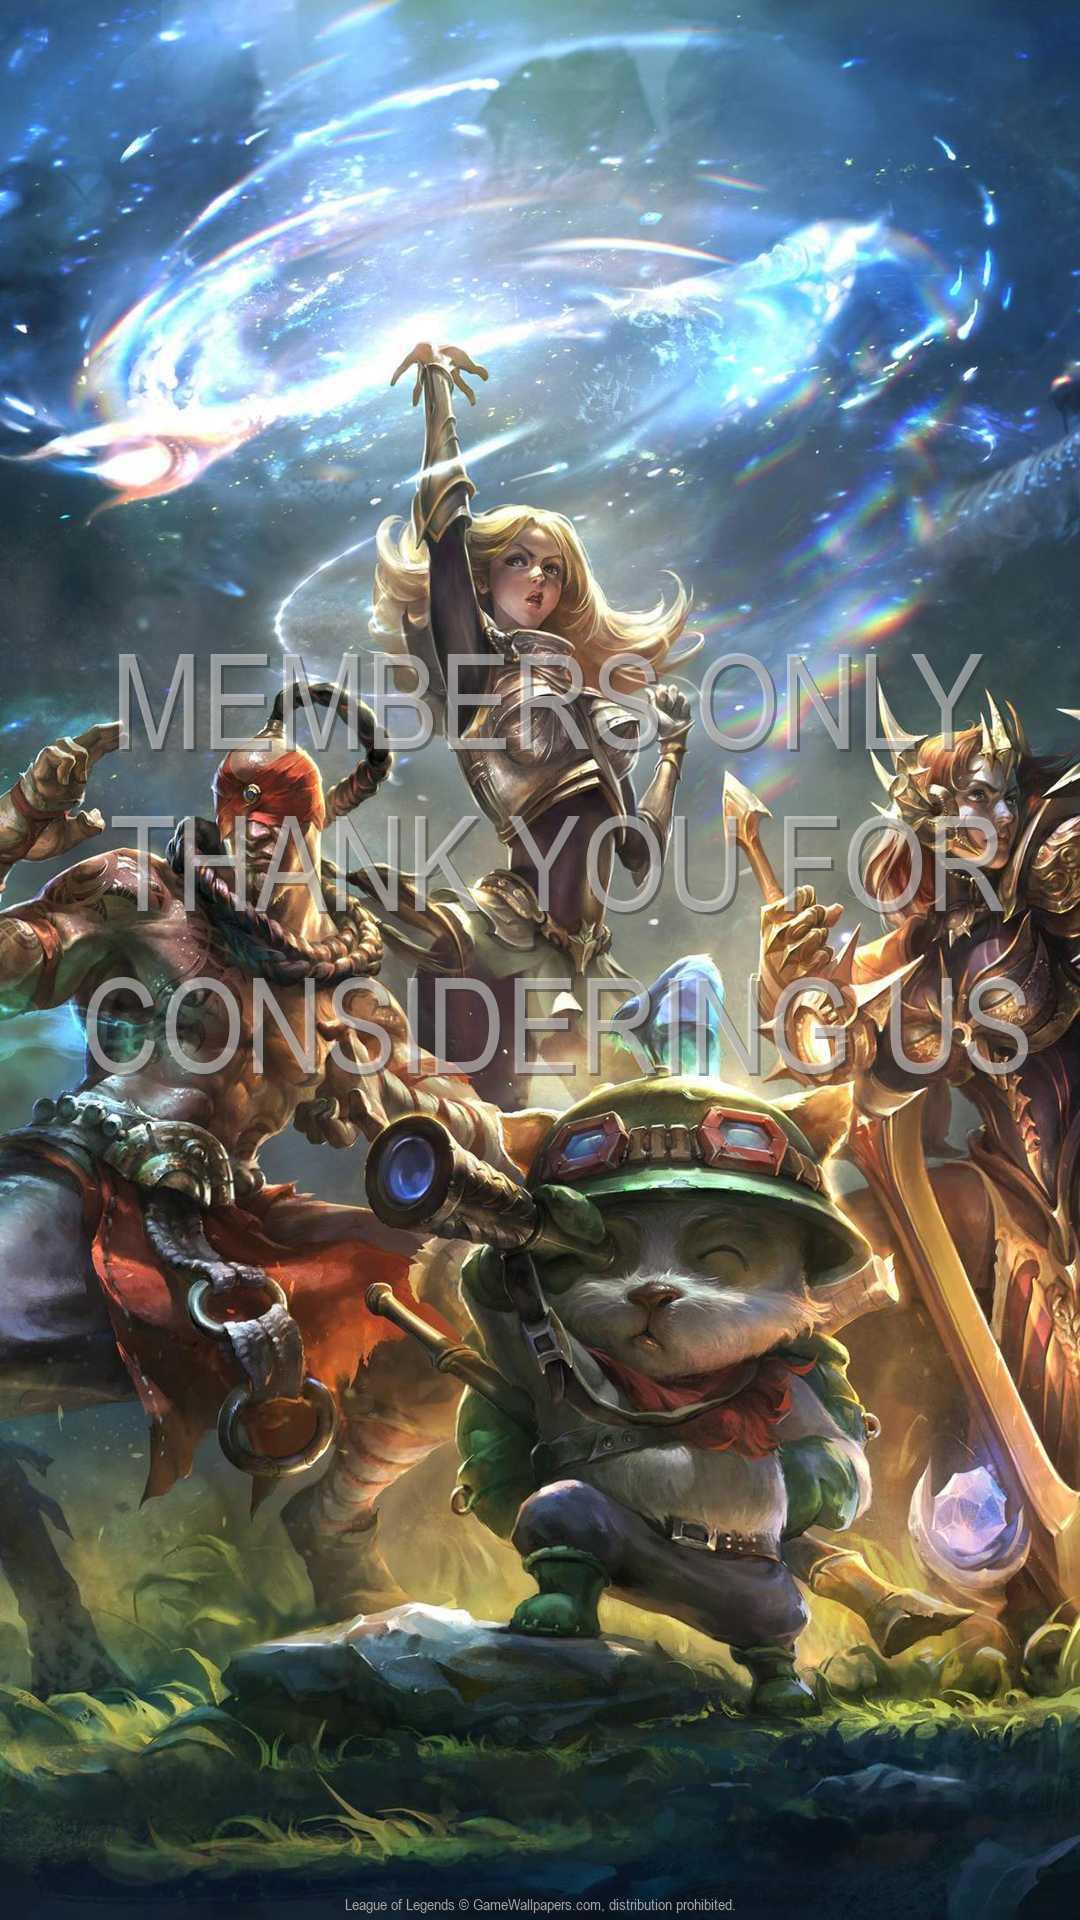 League of Legends 1080p Vertical Móvil fondo de escritorio 20